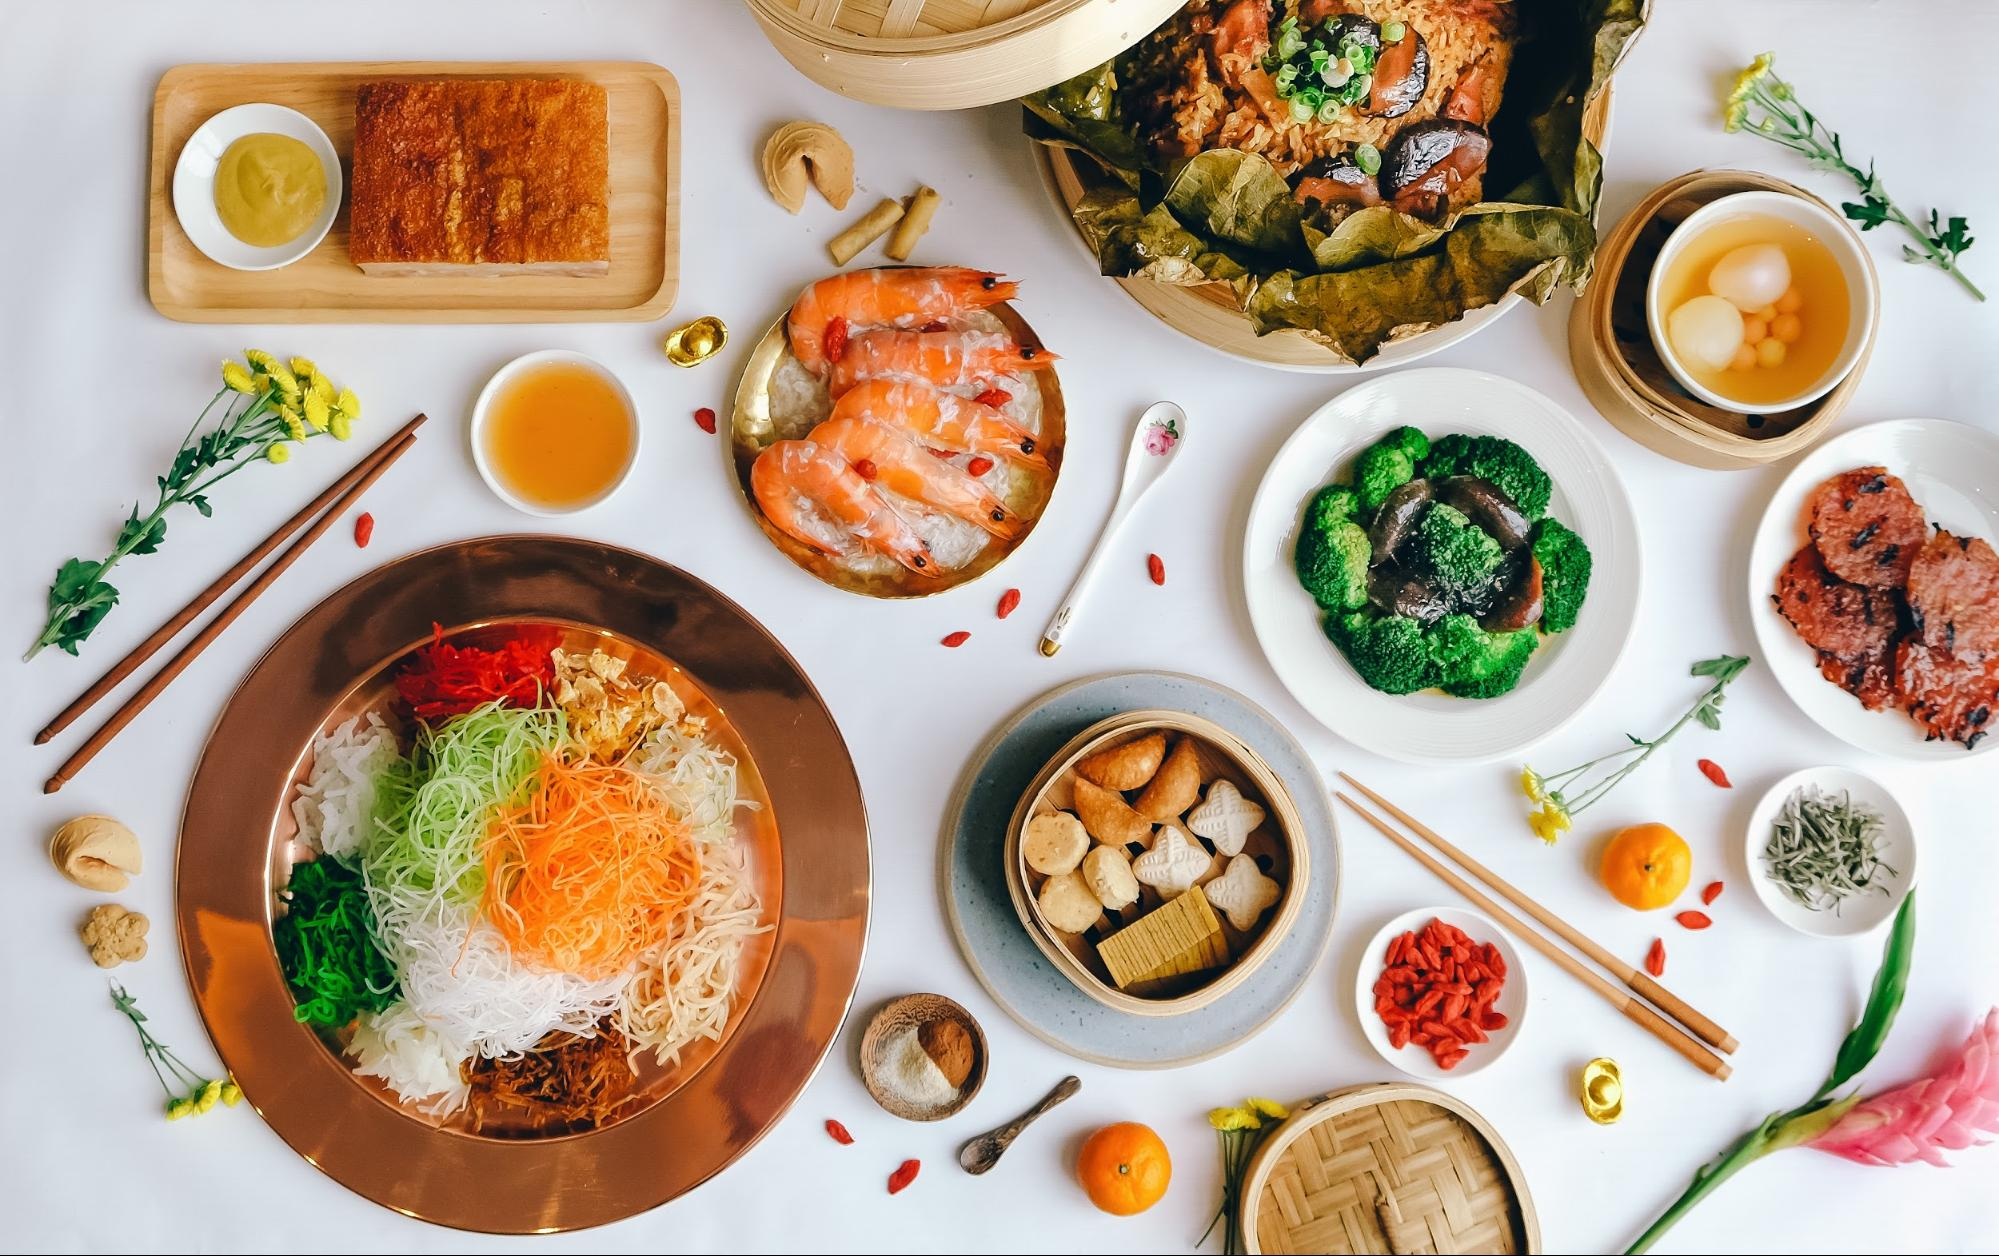 CNY reunion dinner - Sky22